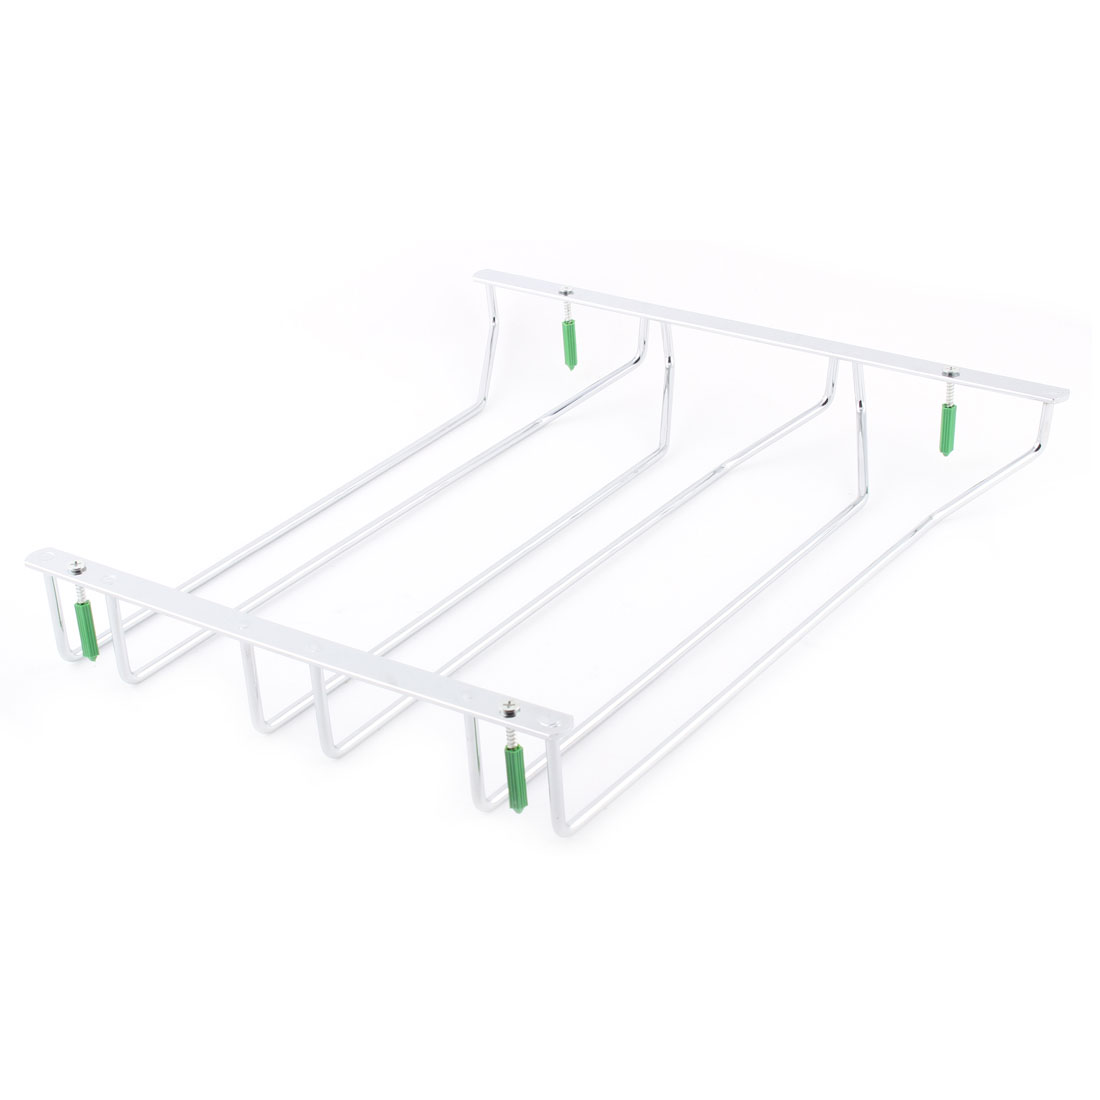 Metal Wine Glass Rack Hanger Bar Home 3 Rows Cup Holder Shelf Silver Tone